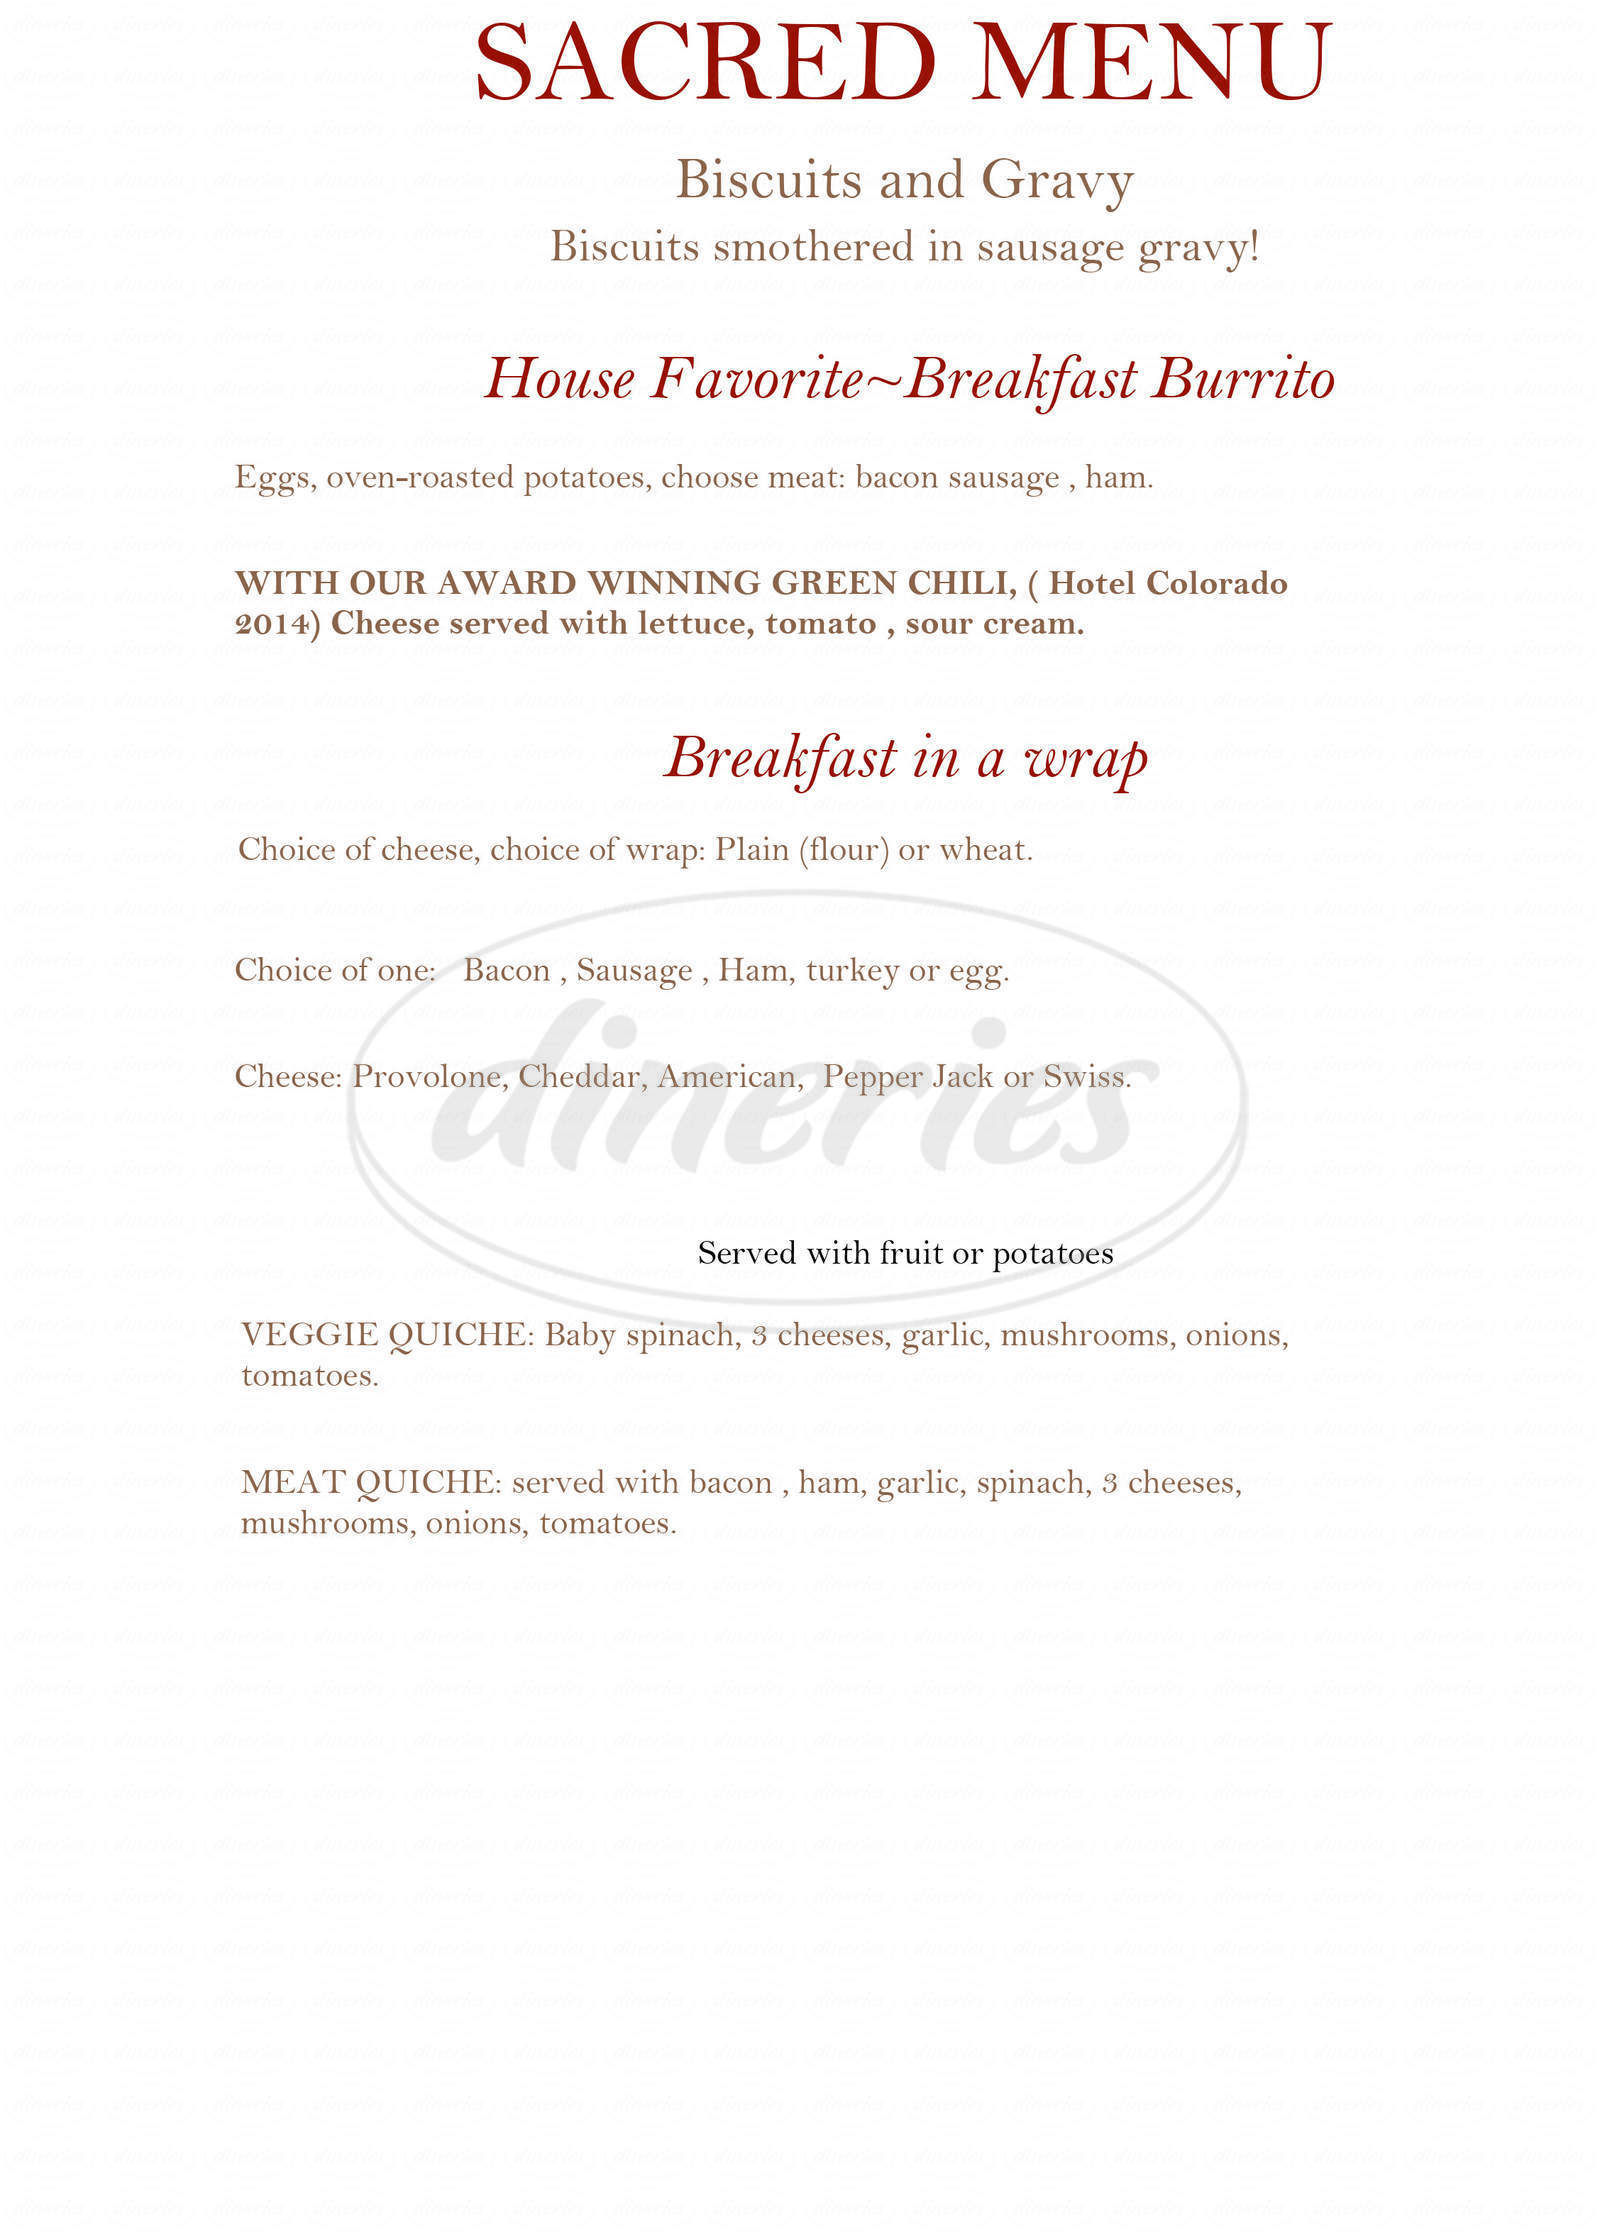 menu for Sacred Grounds